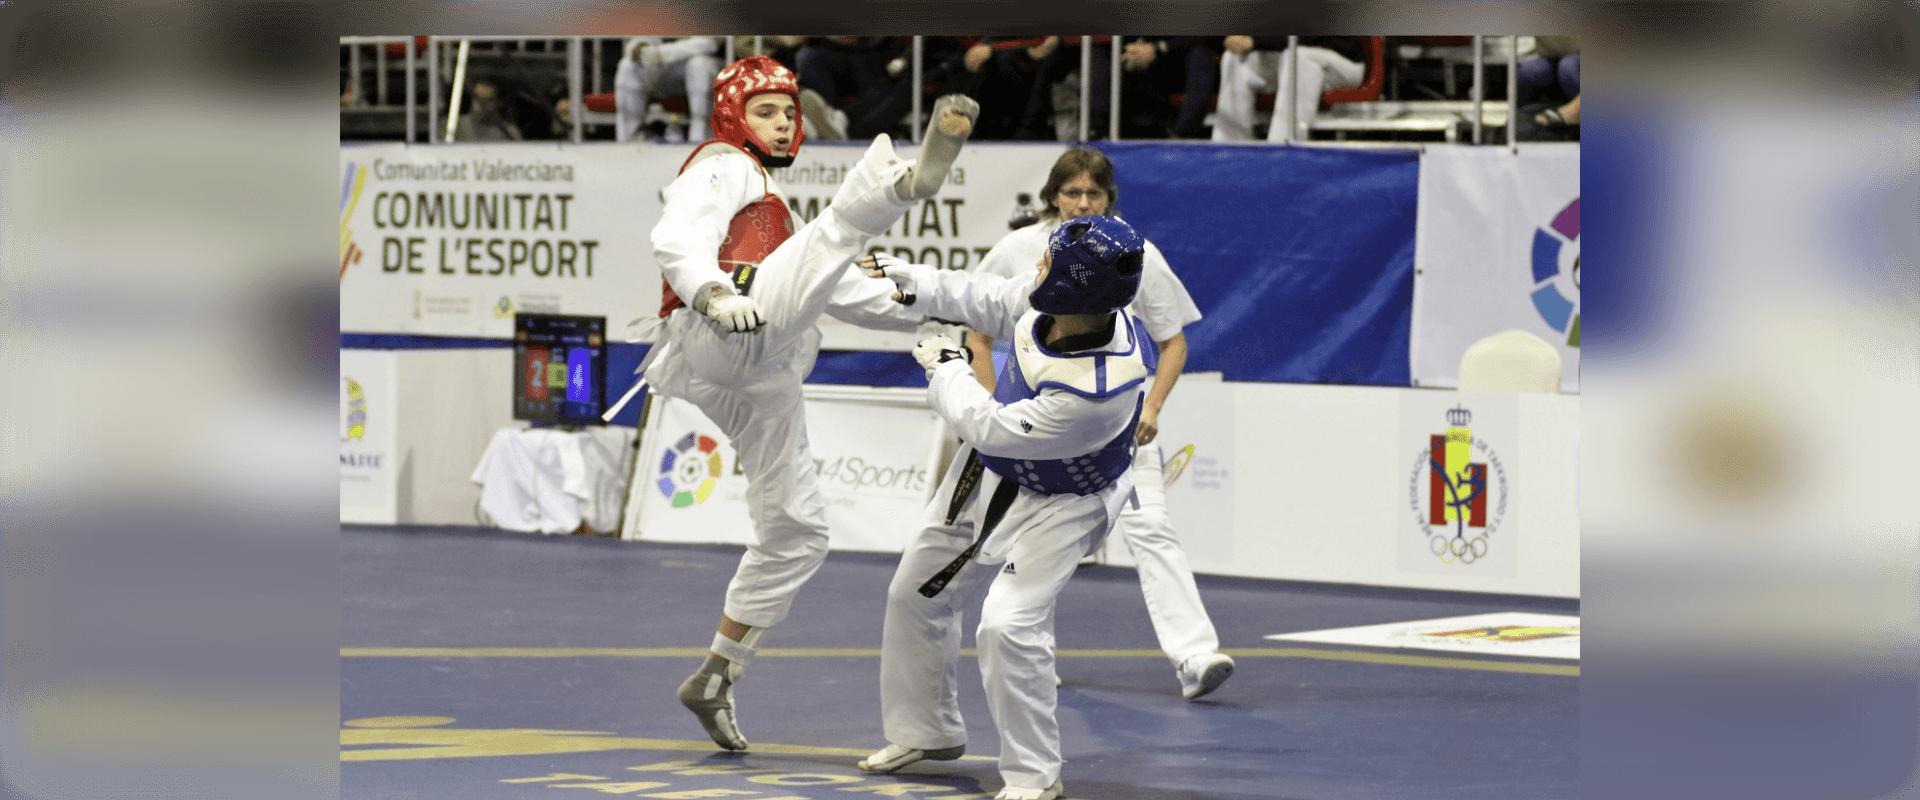 Combate Taekwondo Alan